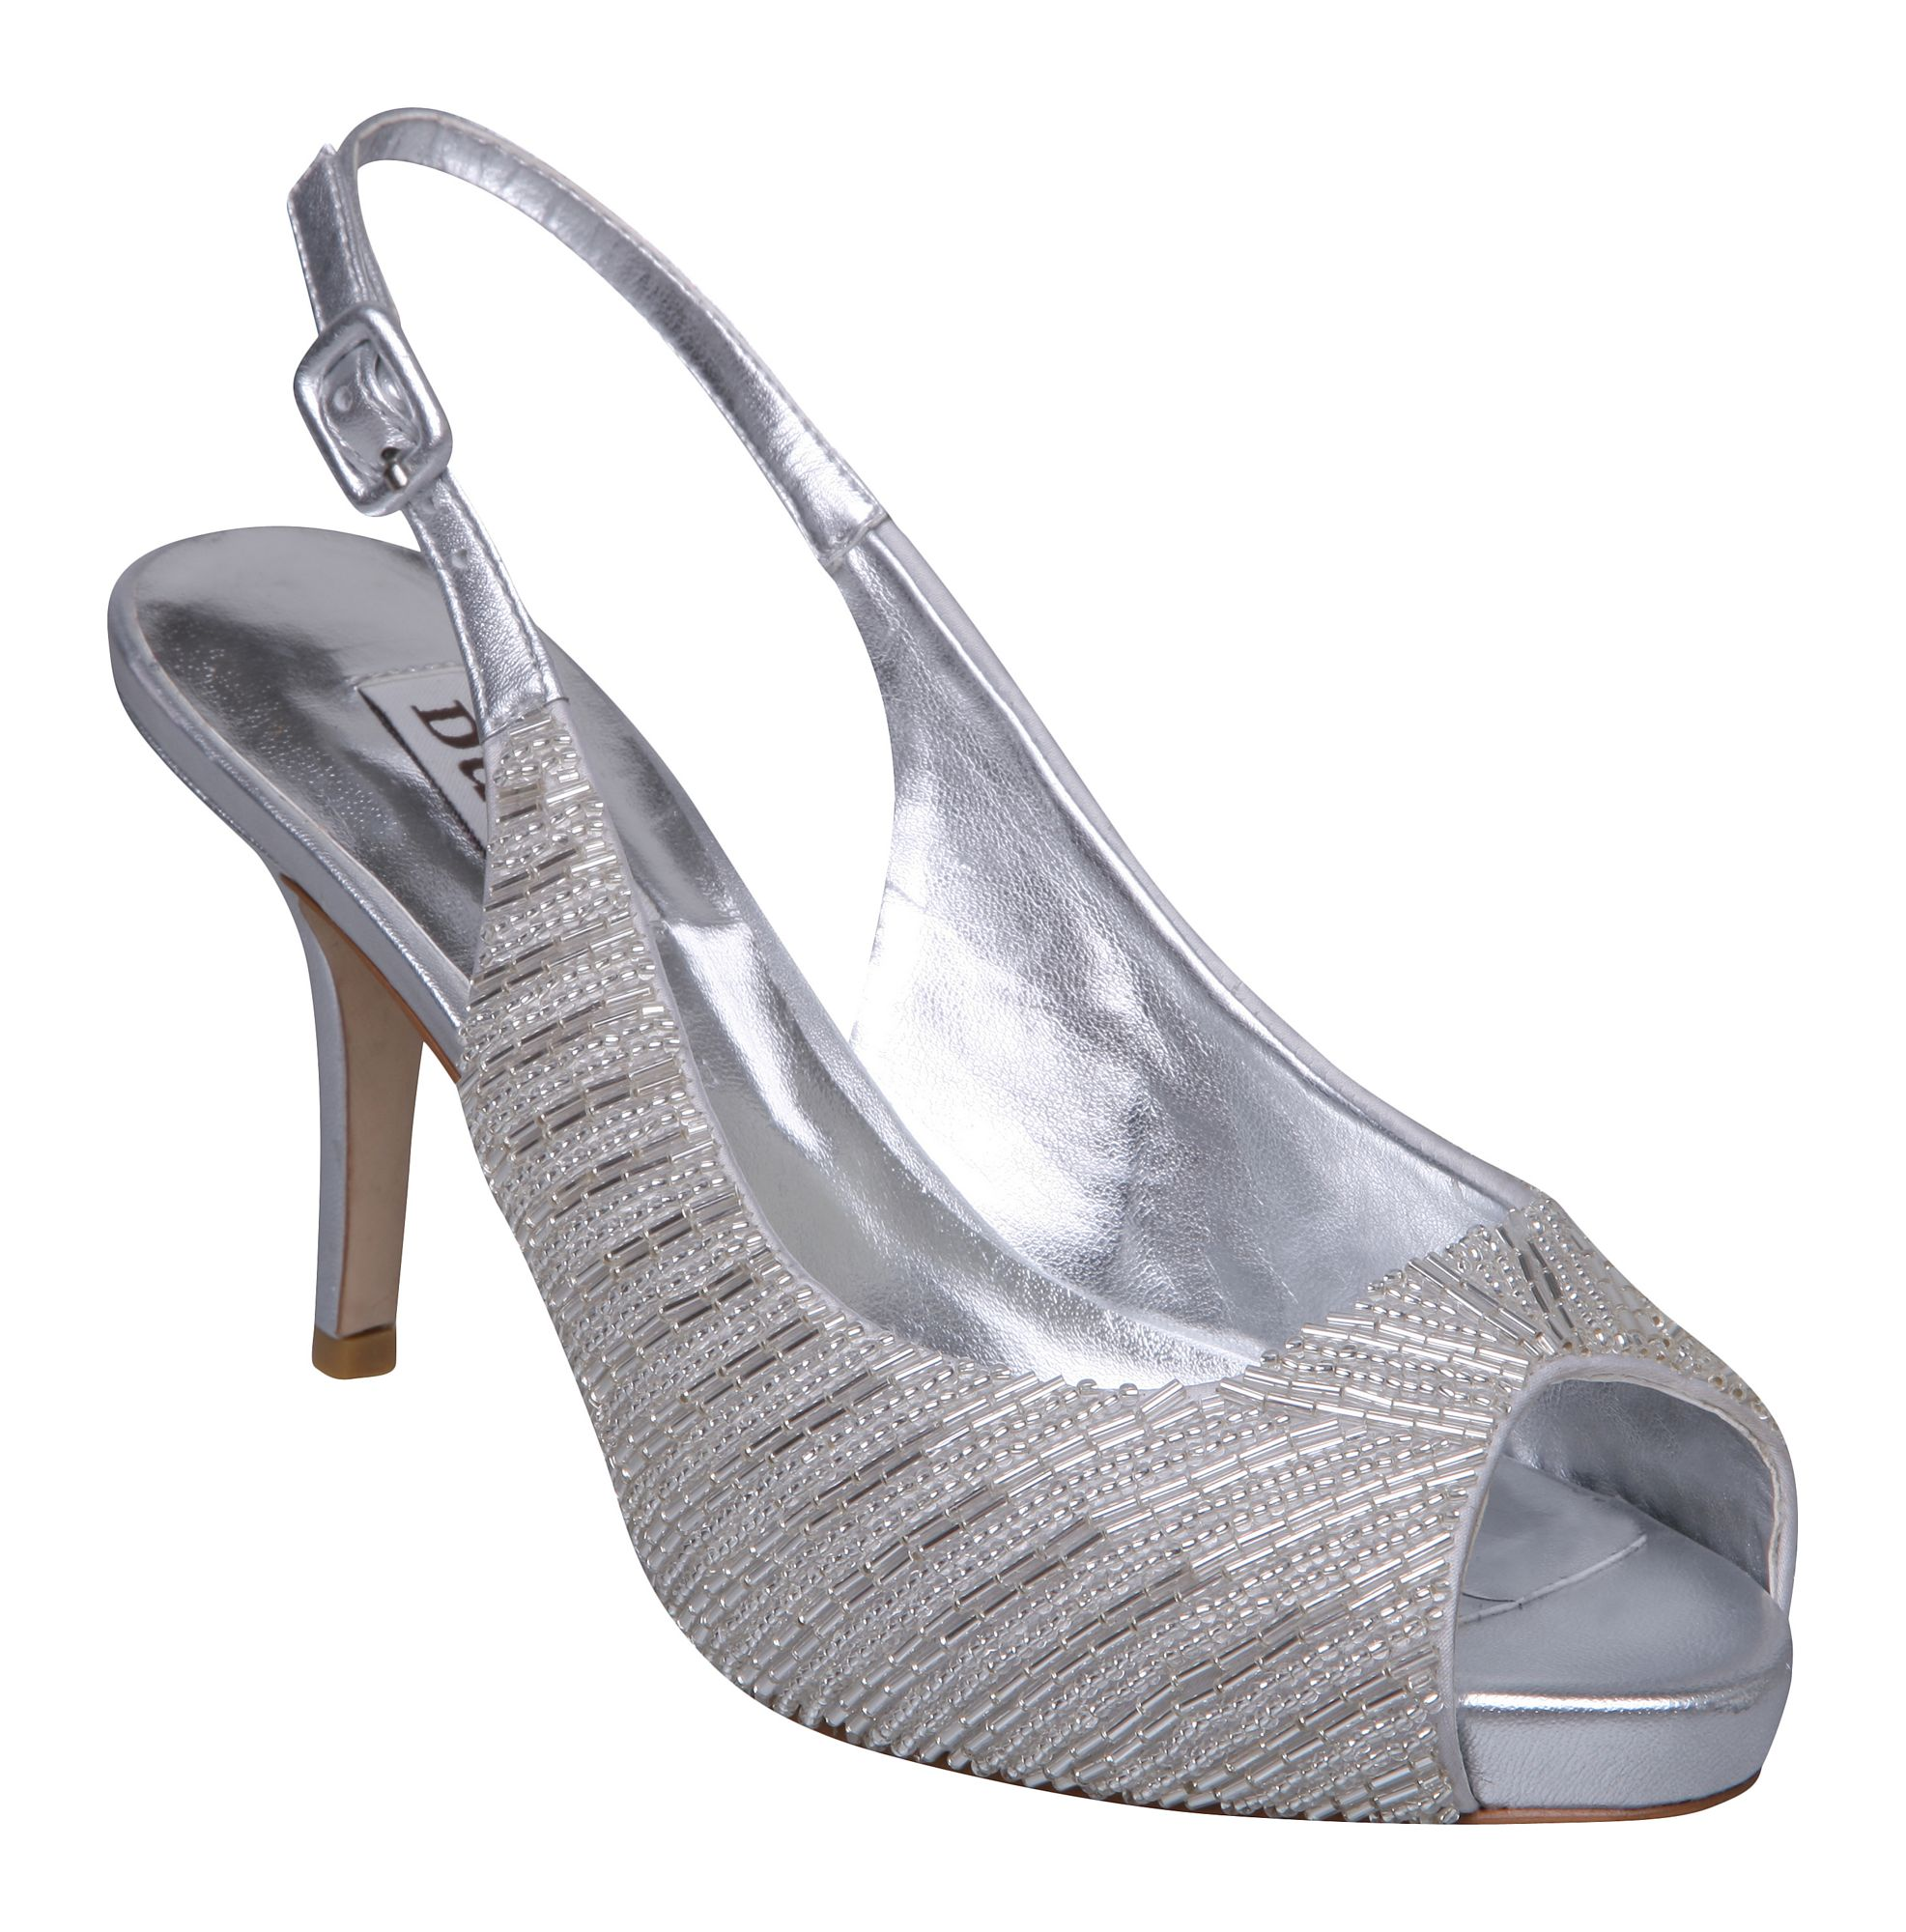 Dune Shoes Silver Sale